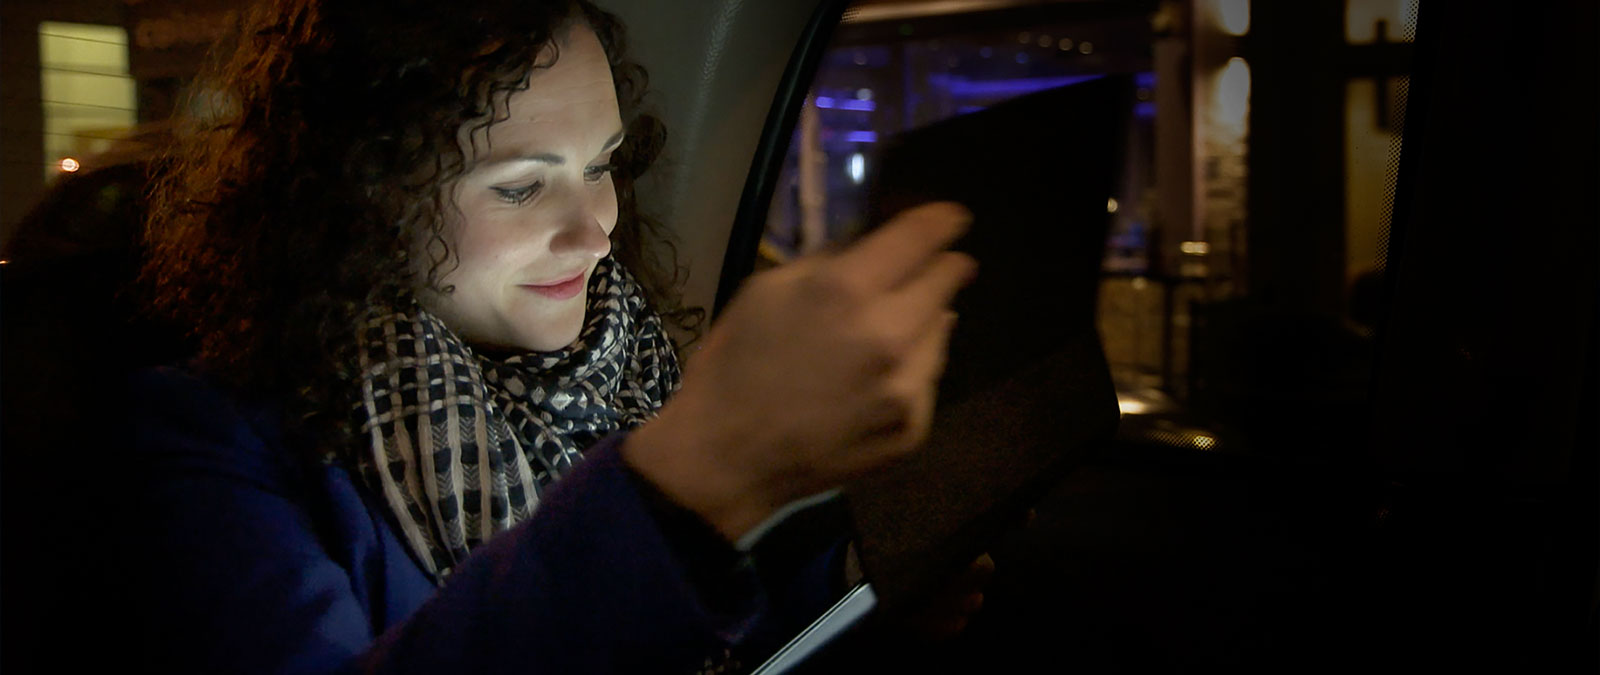 Women in taxi